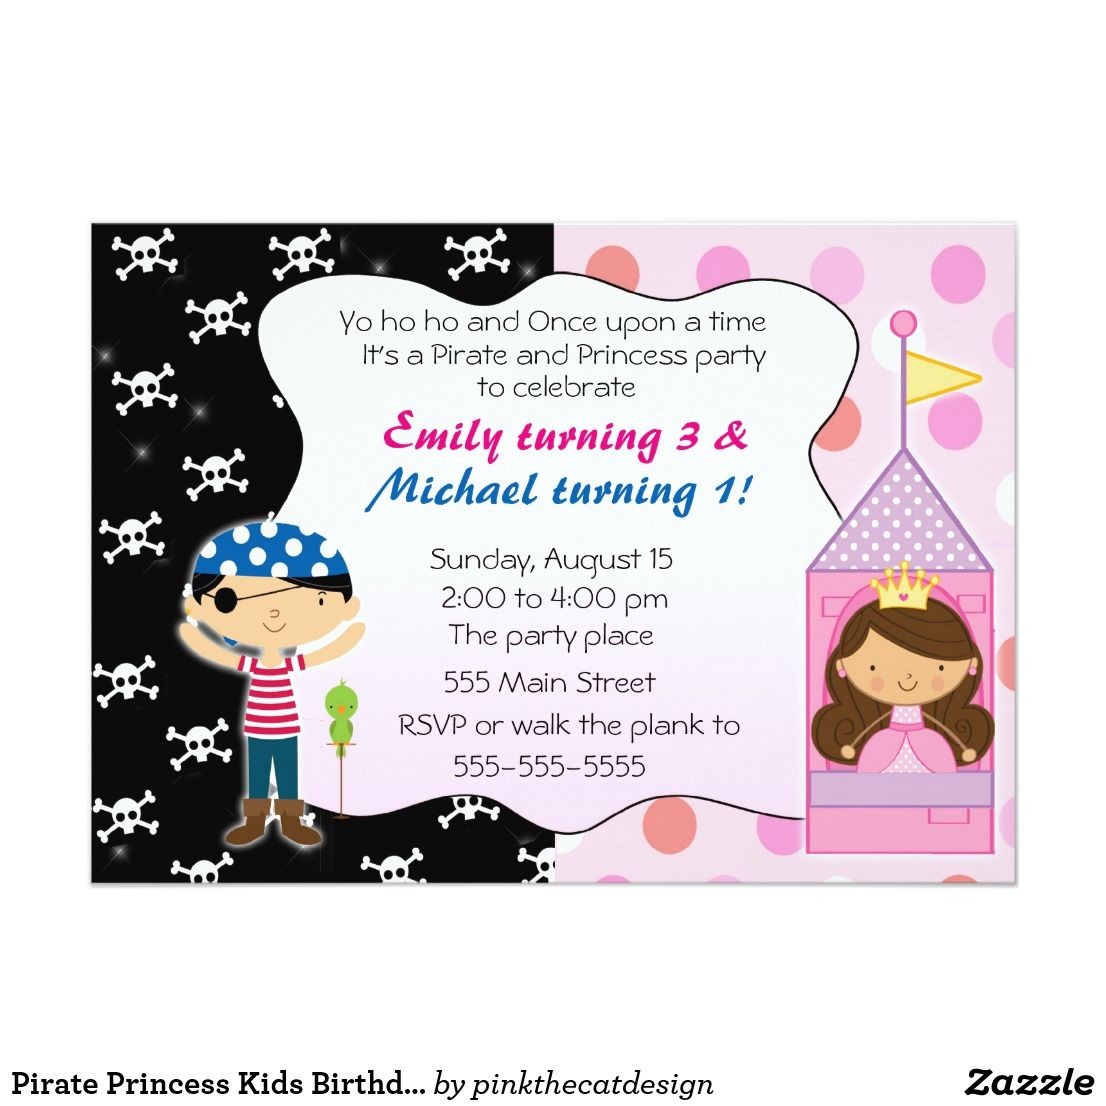 Pirate Princess Kids Birthday Party Invitations | Kid\'s Birthdays ...